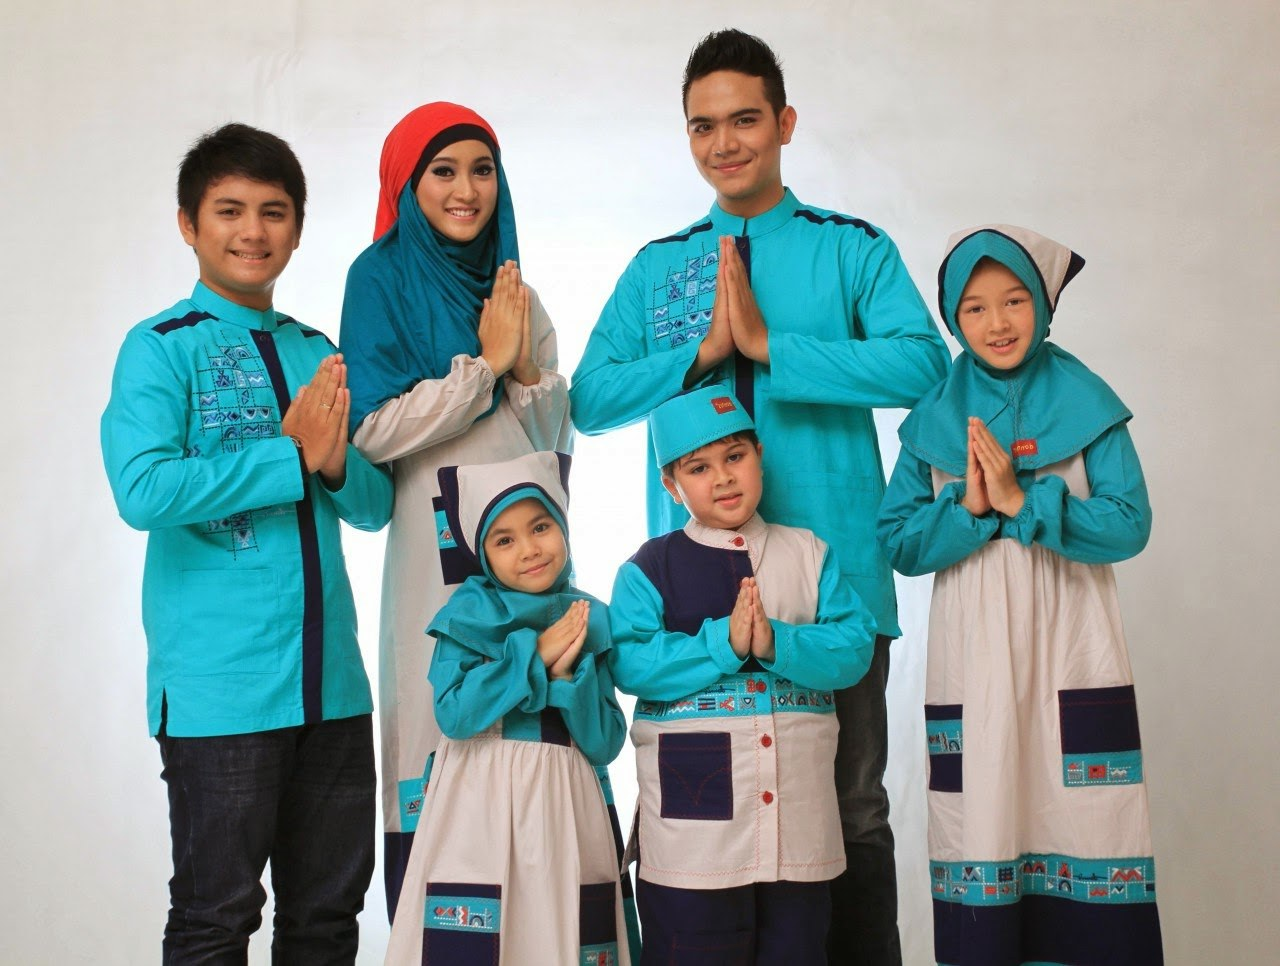 Inspirasi Model Baju Lebaran Keluarga S5d8 Kumpulan Foto Model Baju Kebaya Lebaran Trend Baju Kebaya